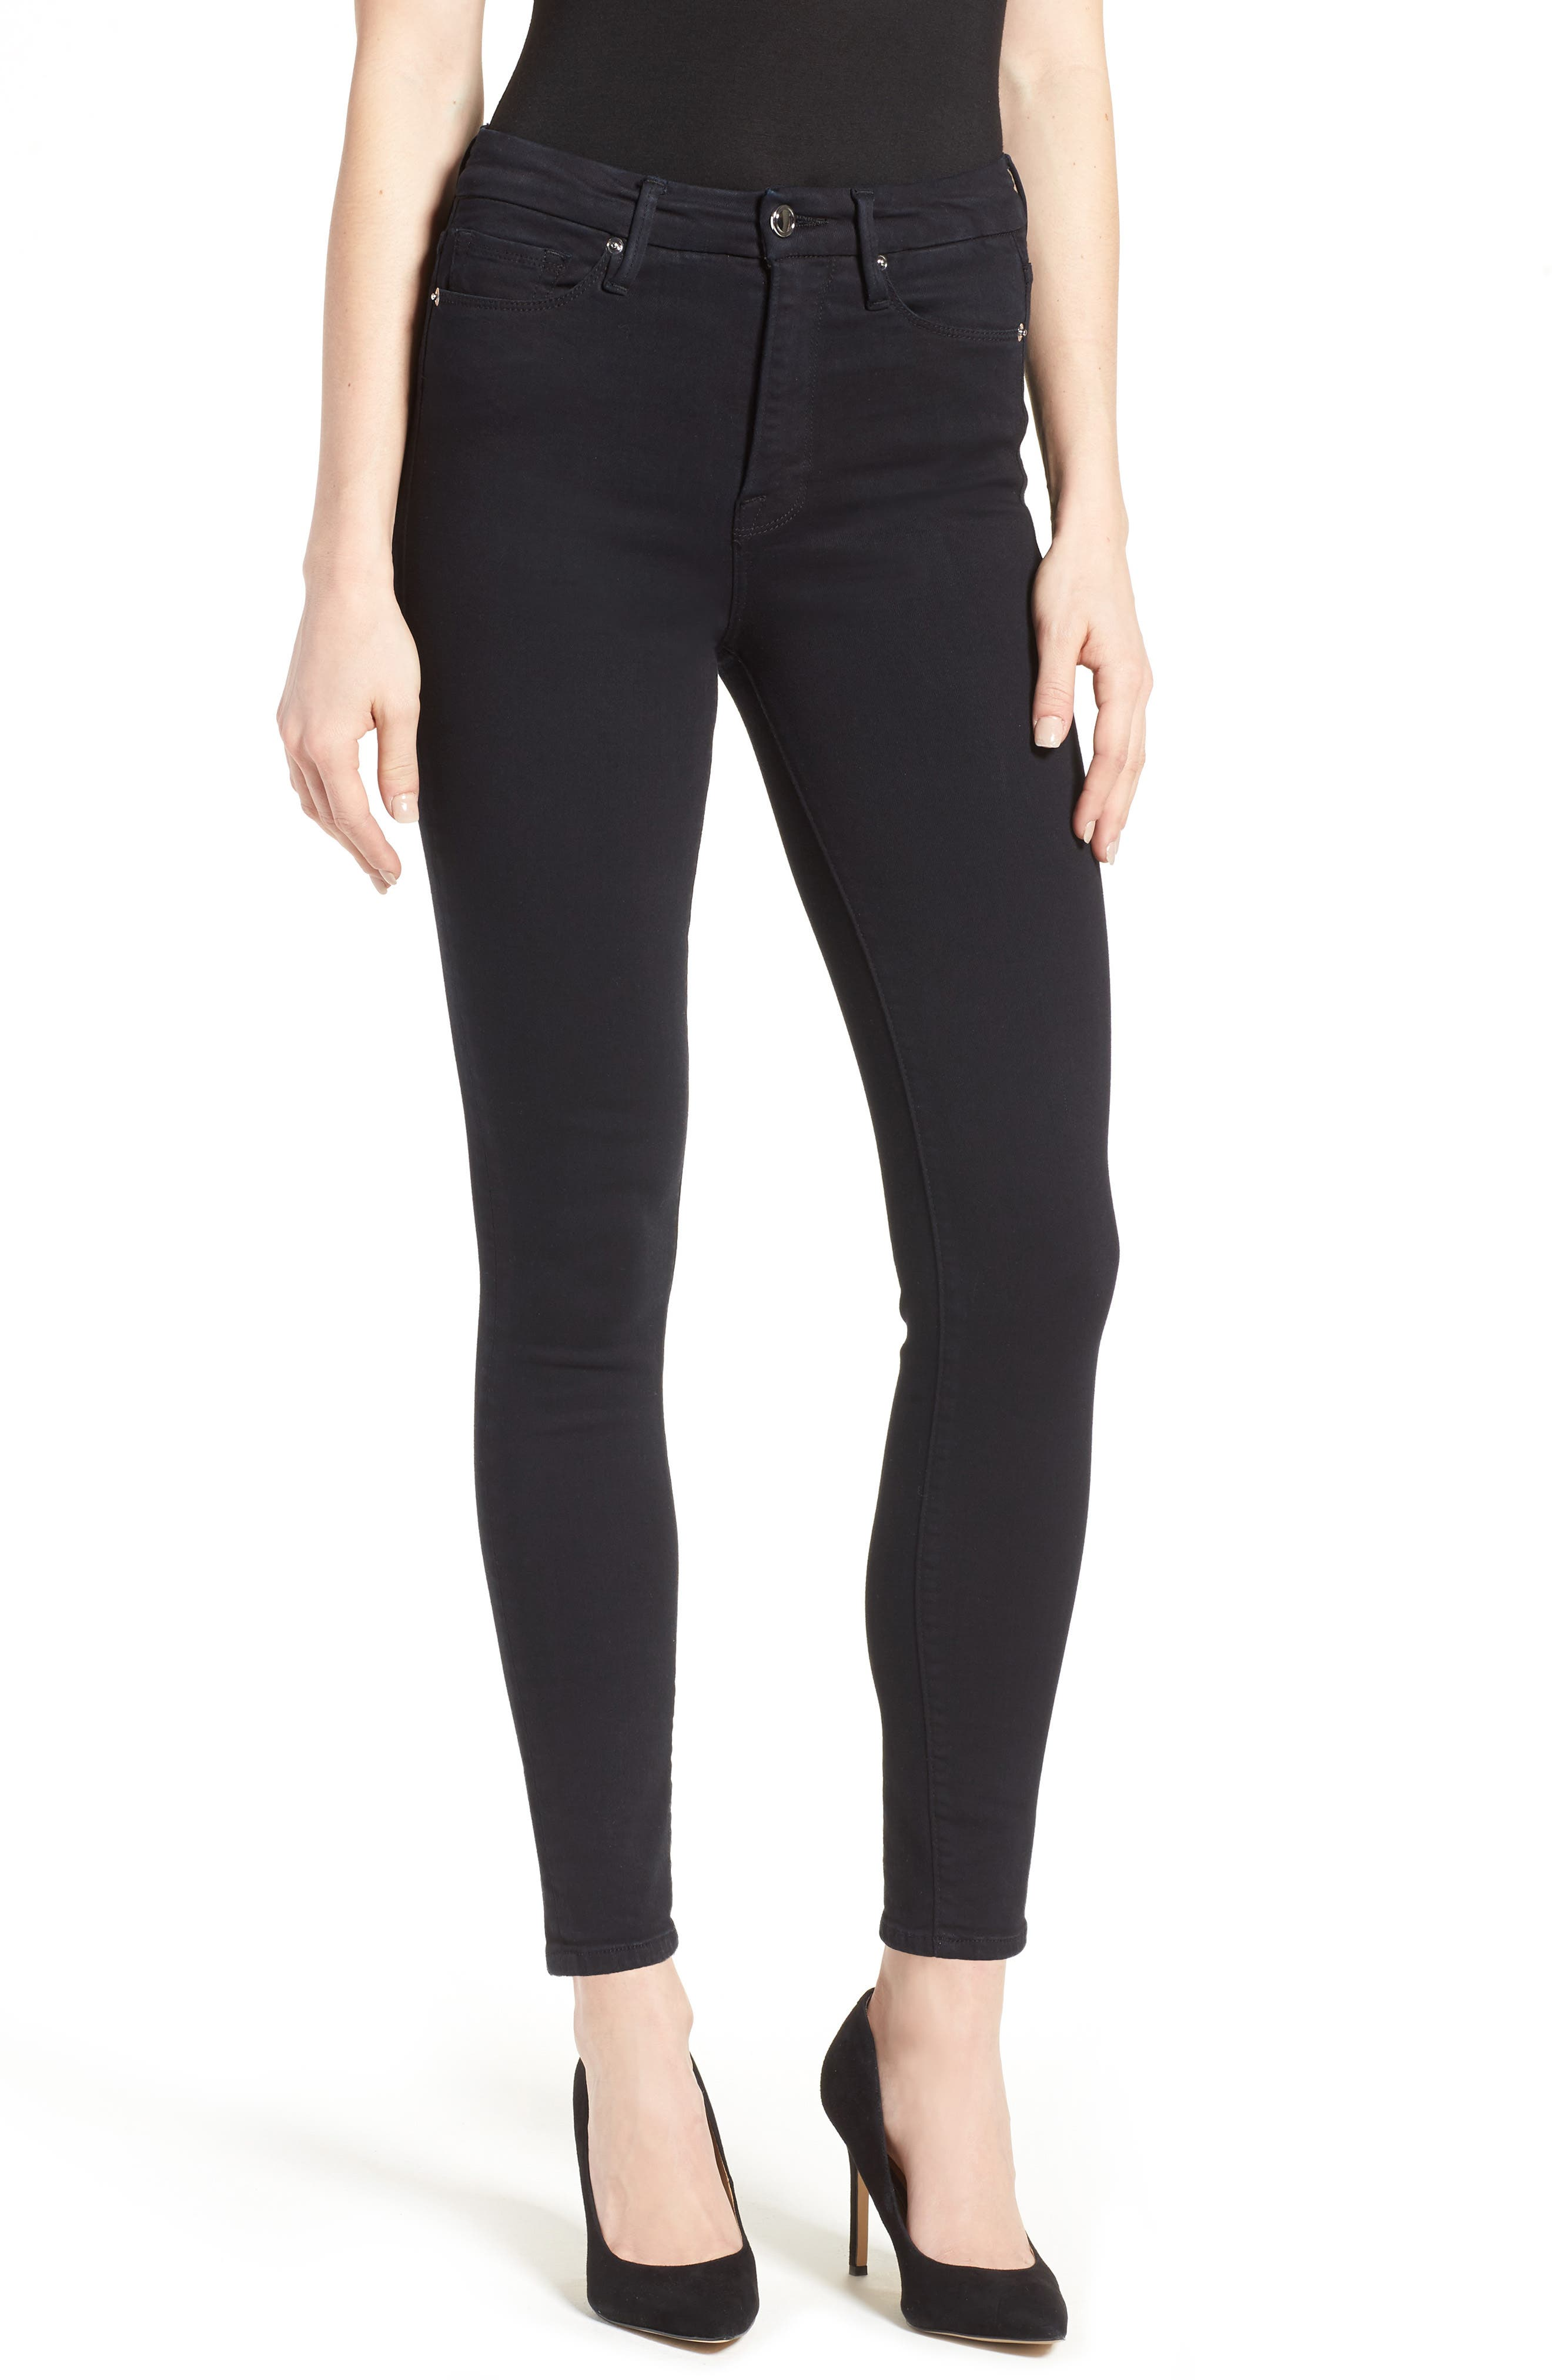 Alternate Image 1 Selected - Good American Good Waist High Rise Skinny Jeans (Black 004)